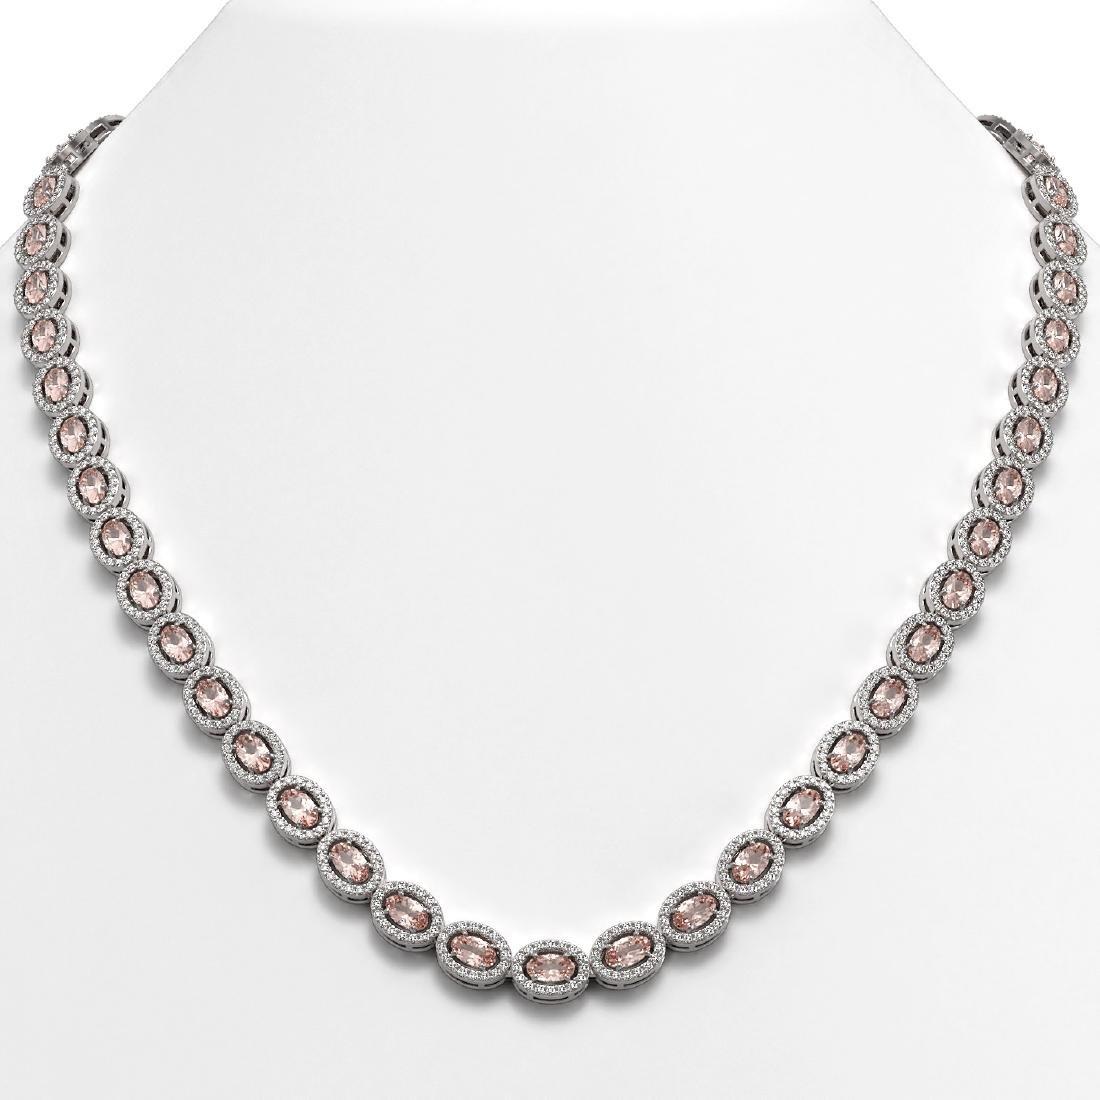 23.48 CTW Morganite & Diamond Halo Necklace 10K White